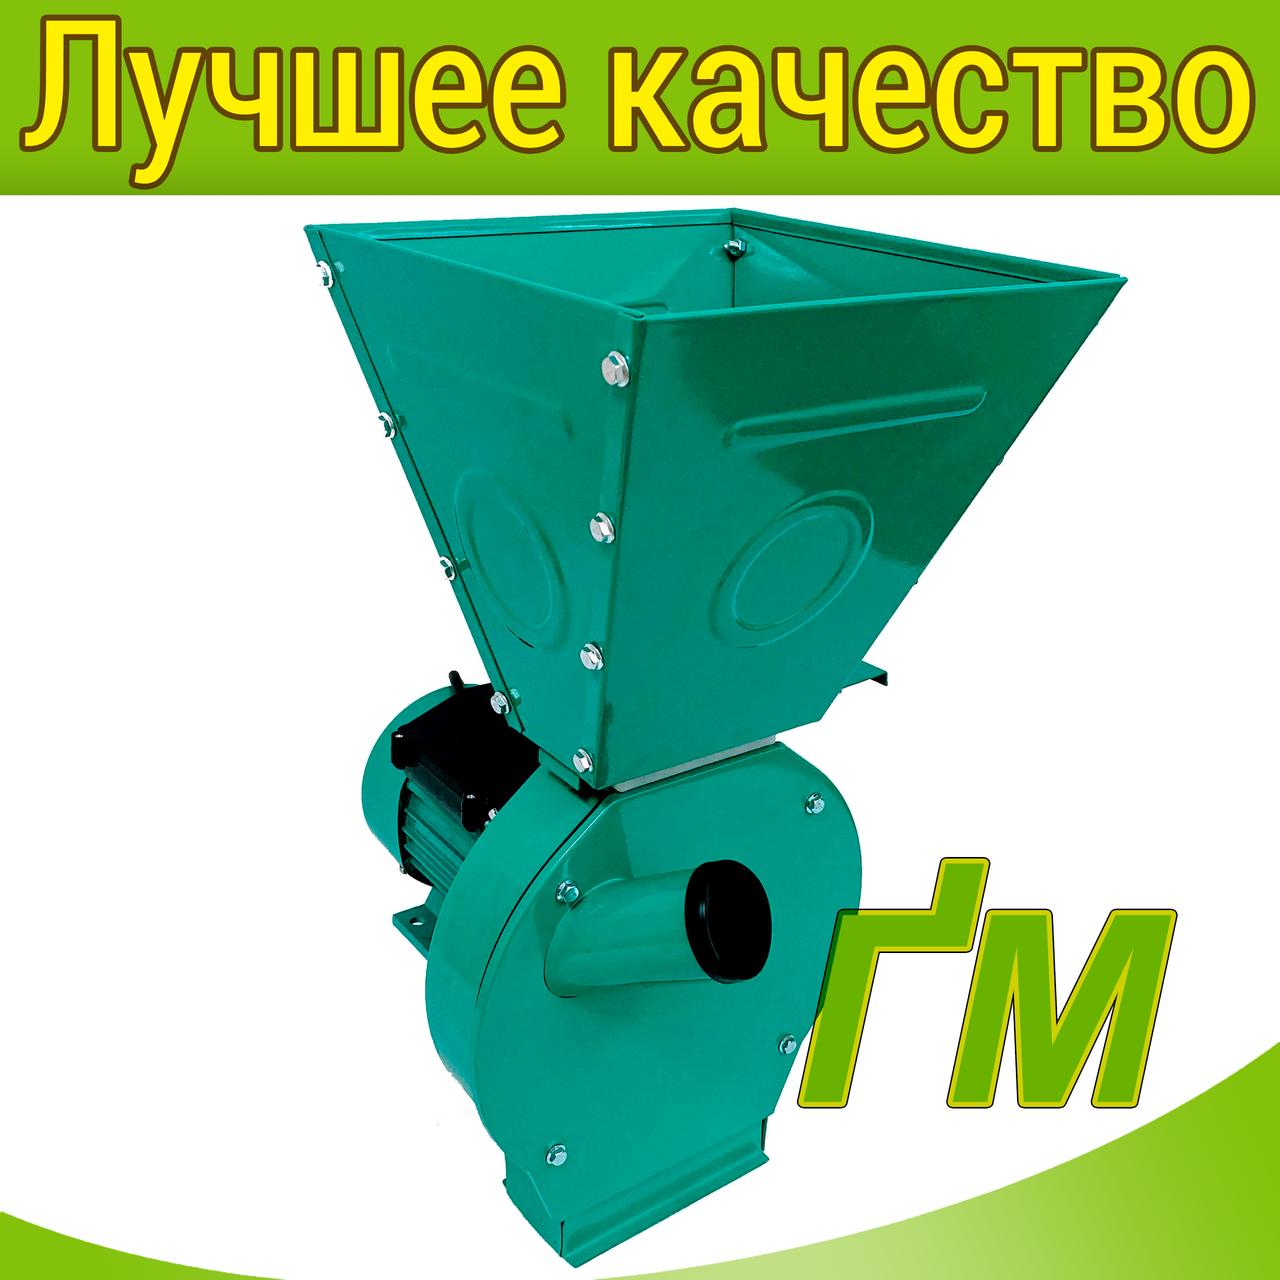 Зернодробилка Минск Электро ДКЗ-3500